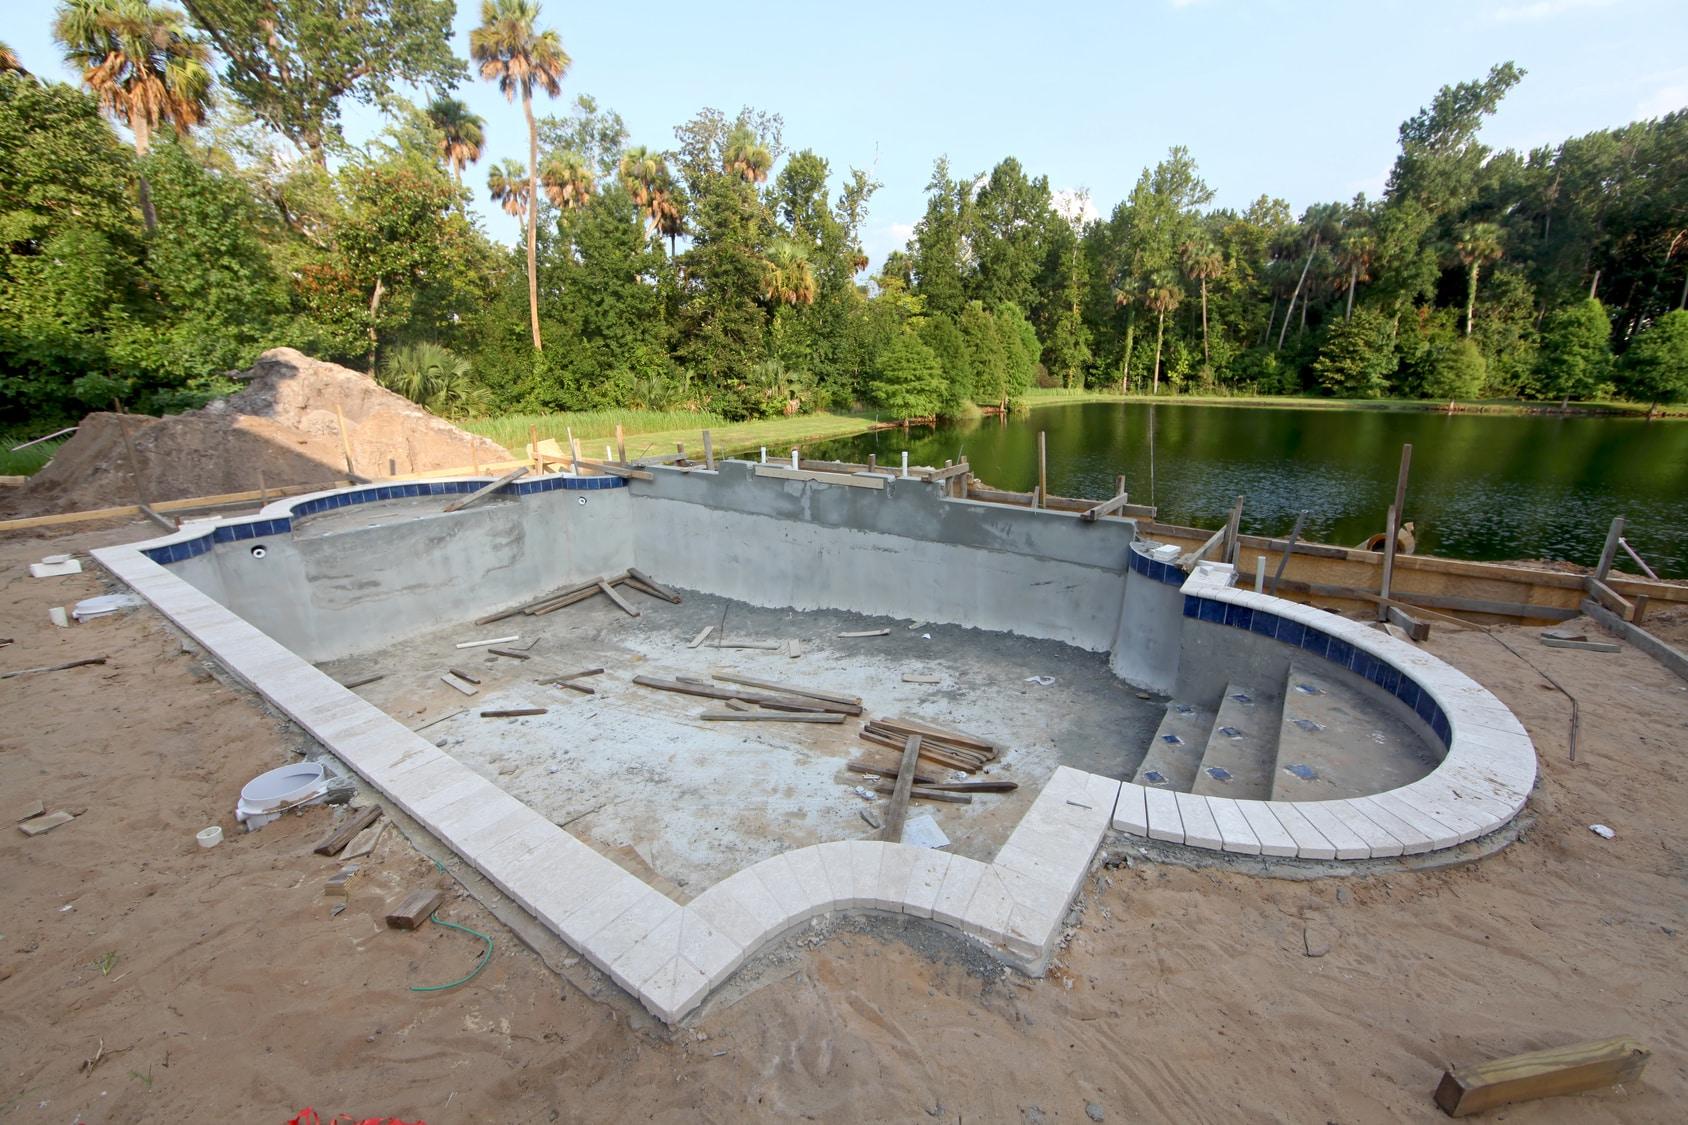 renovationettravaux.fr/wp-content/uploads/2015/01/piscine-béton-en-construction.jpg